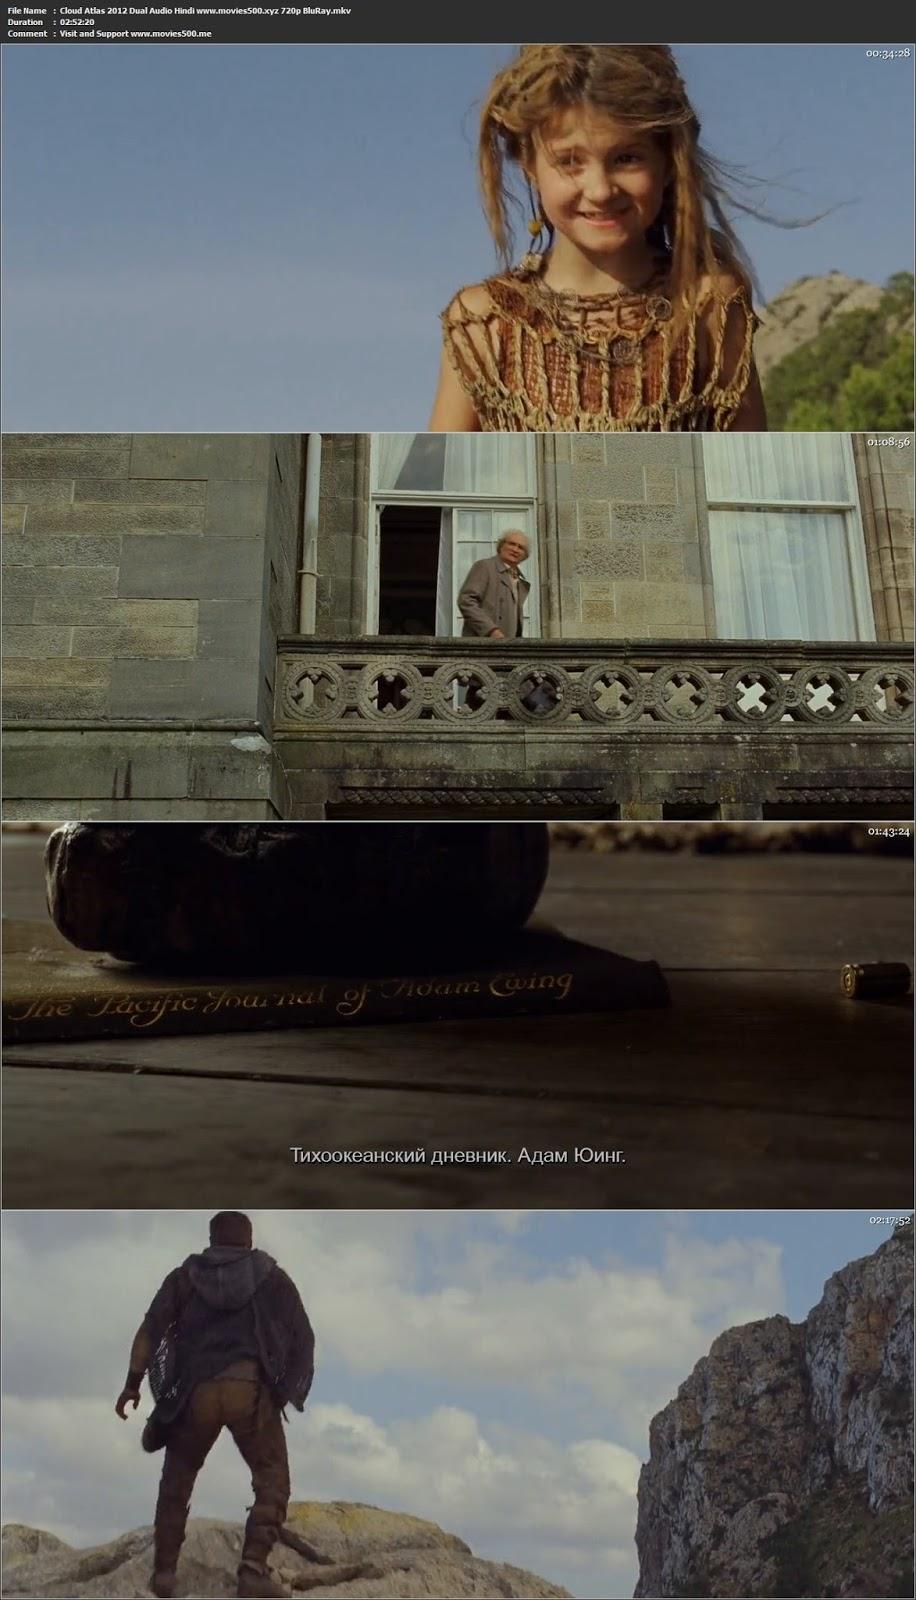 Cloud Atlas 2012 Dual Audio Hindi Full Movie BluRay 720p at movies500.site